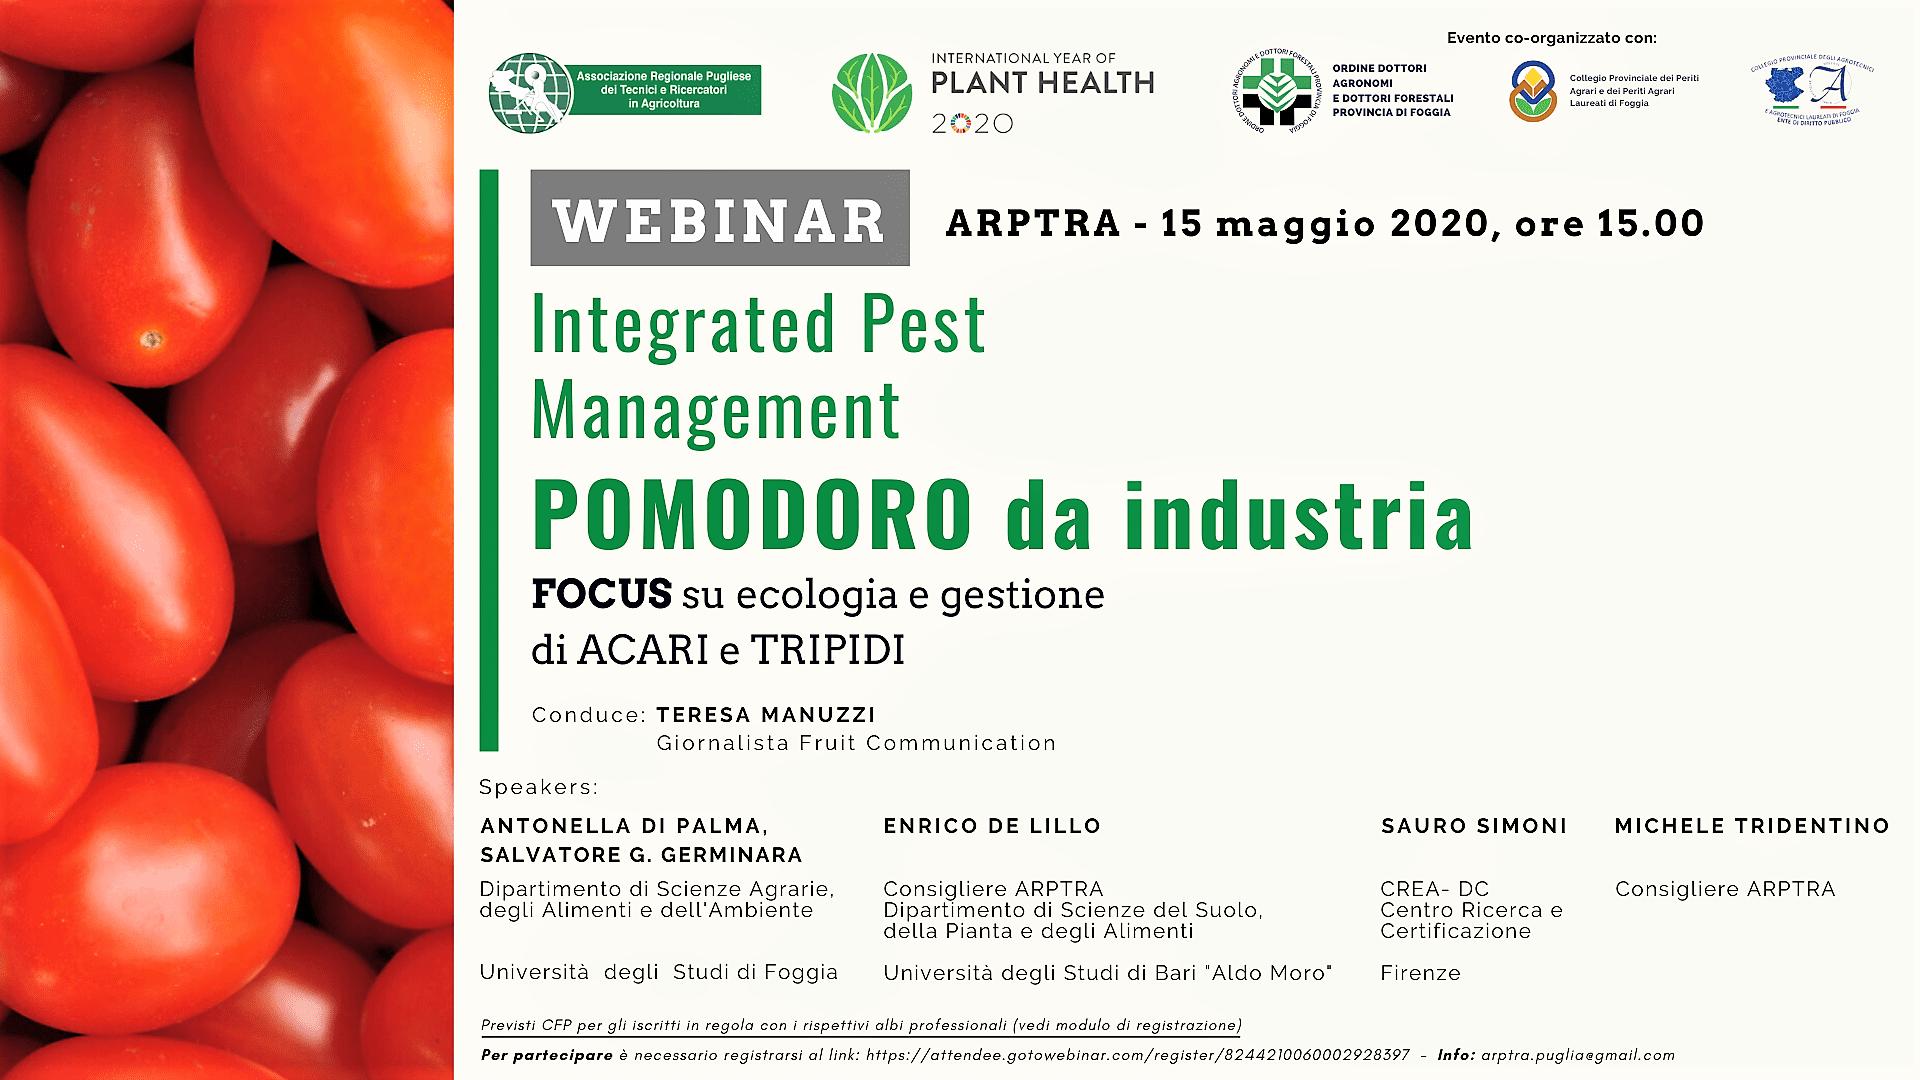 webinar-pomodoro-da-industria